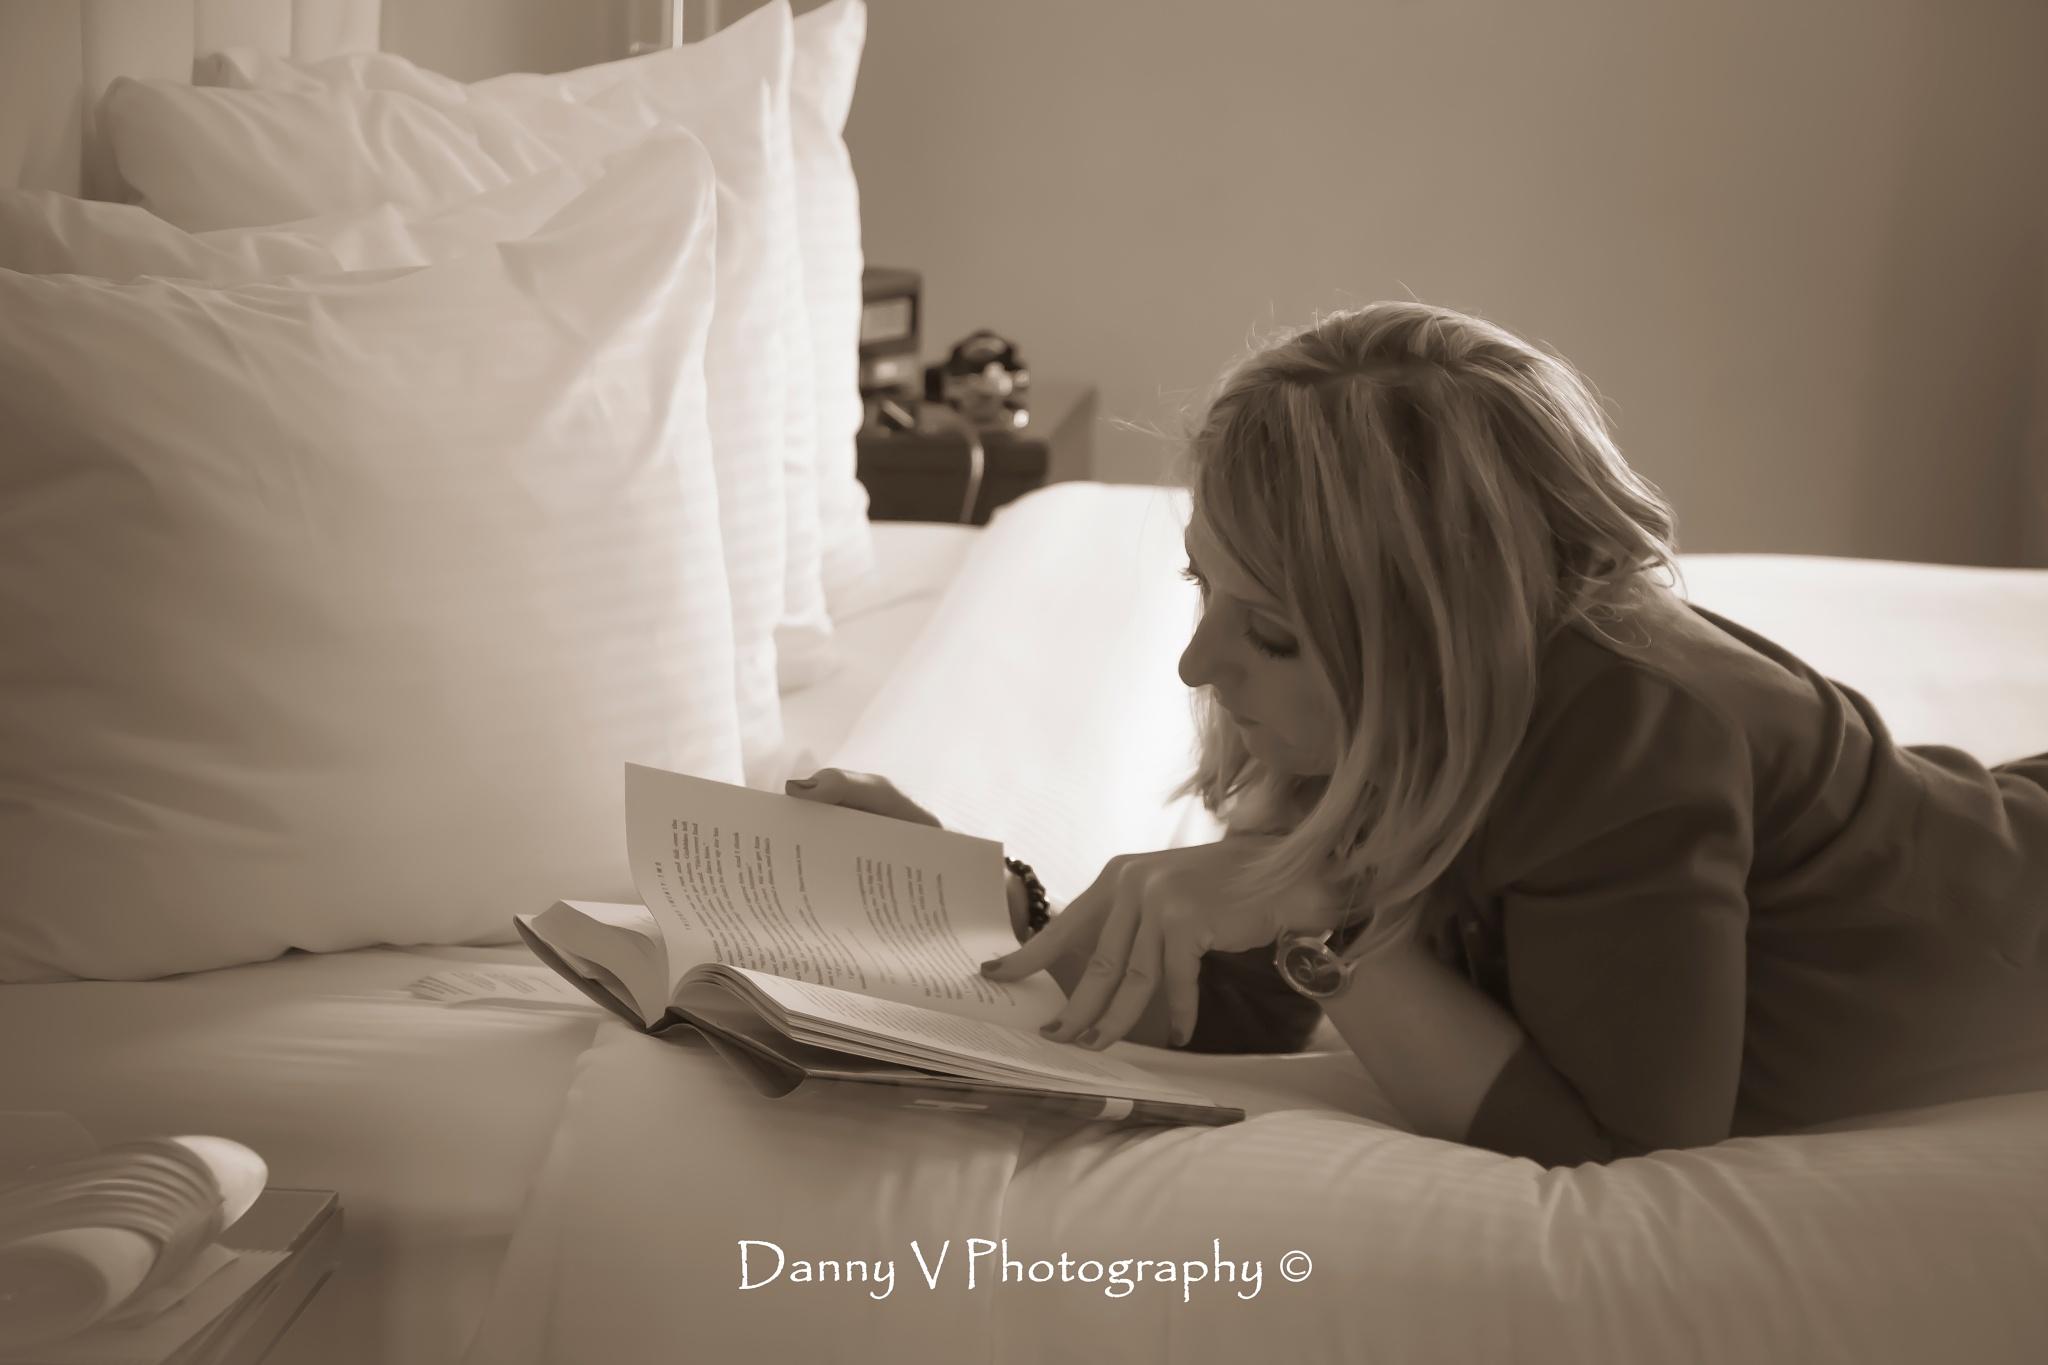 Avid Reader by Danny V Photography